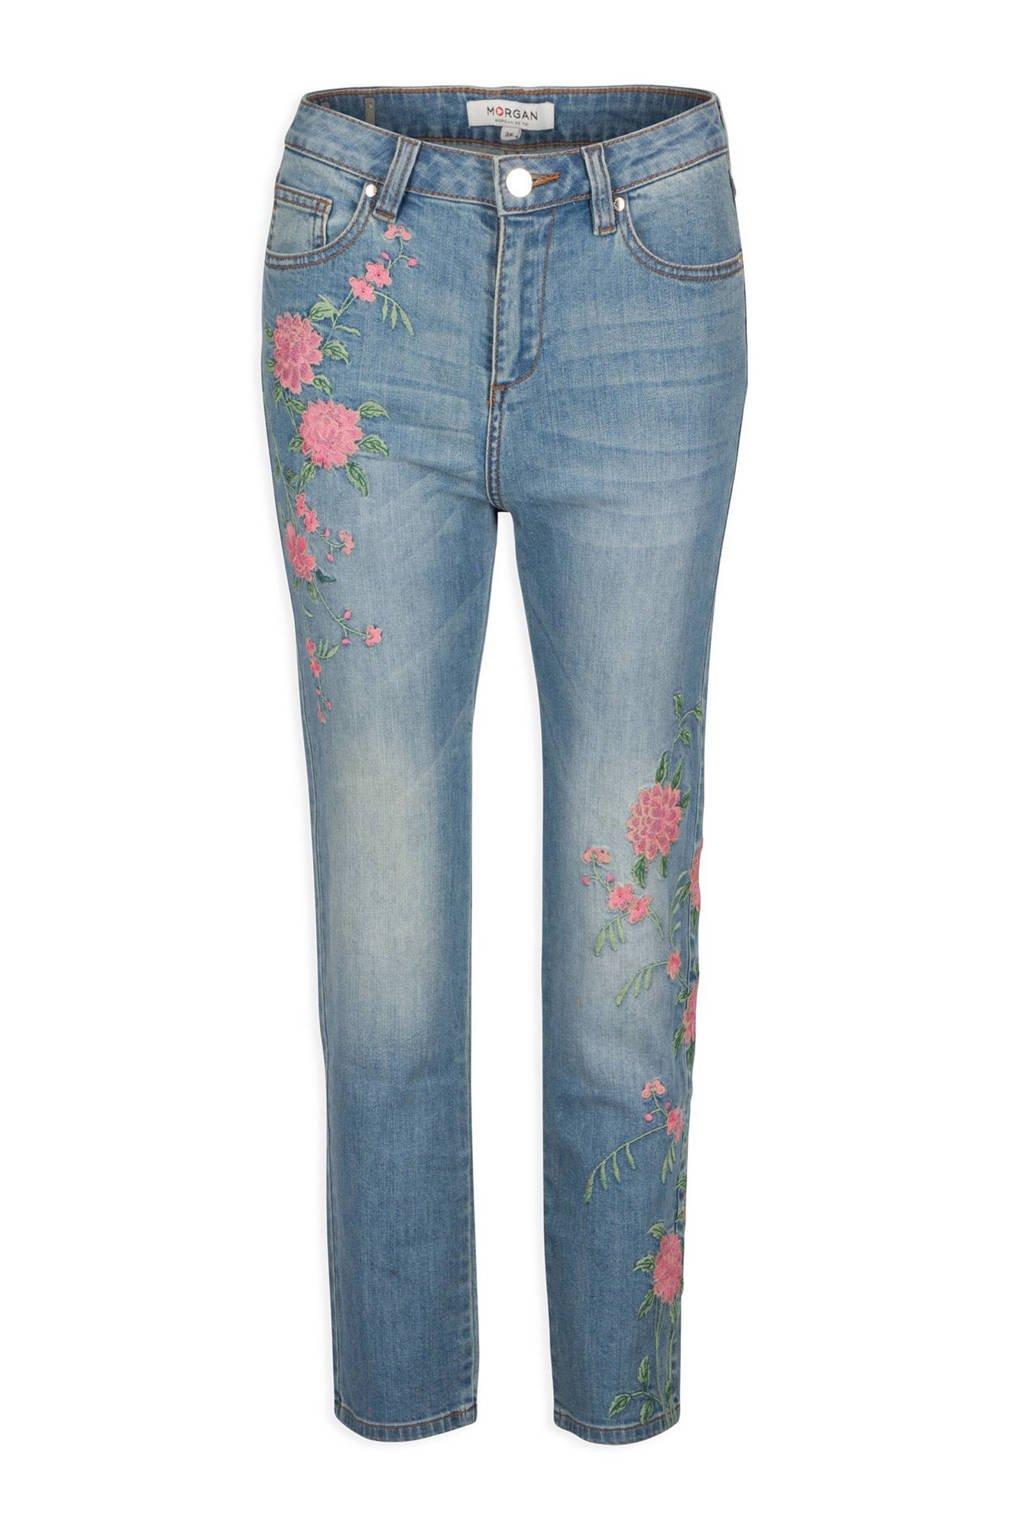 Morgan high waisted jeans met bloemborduursels, Blauw